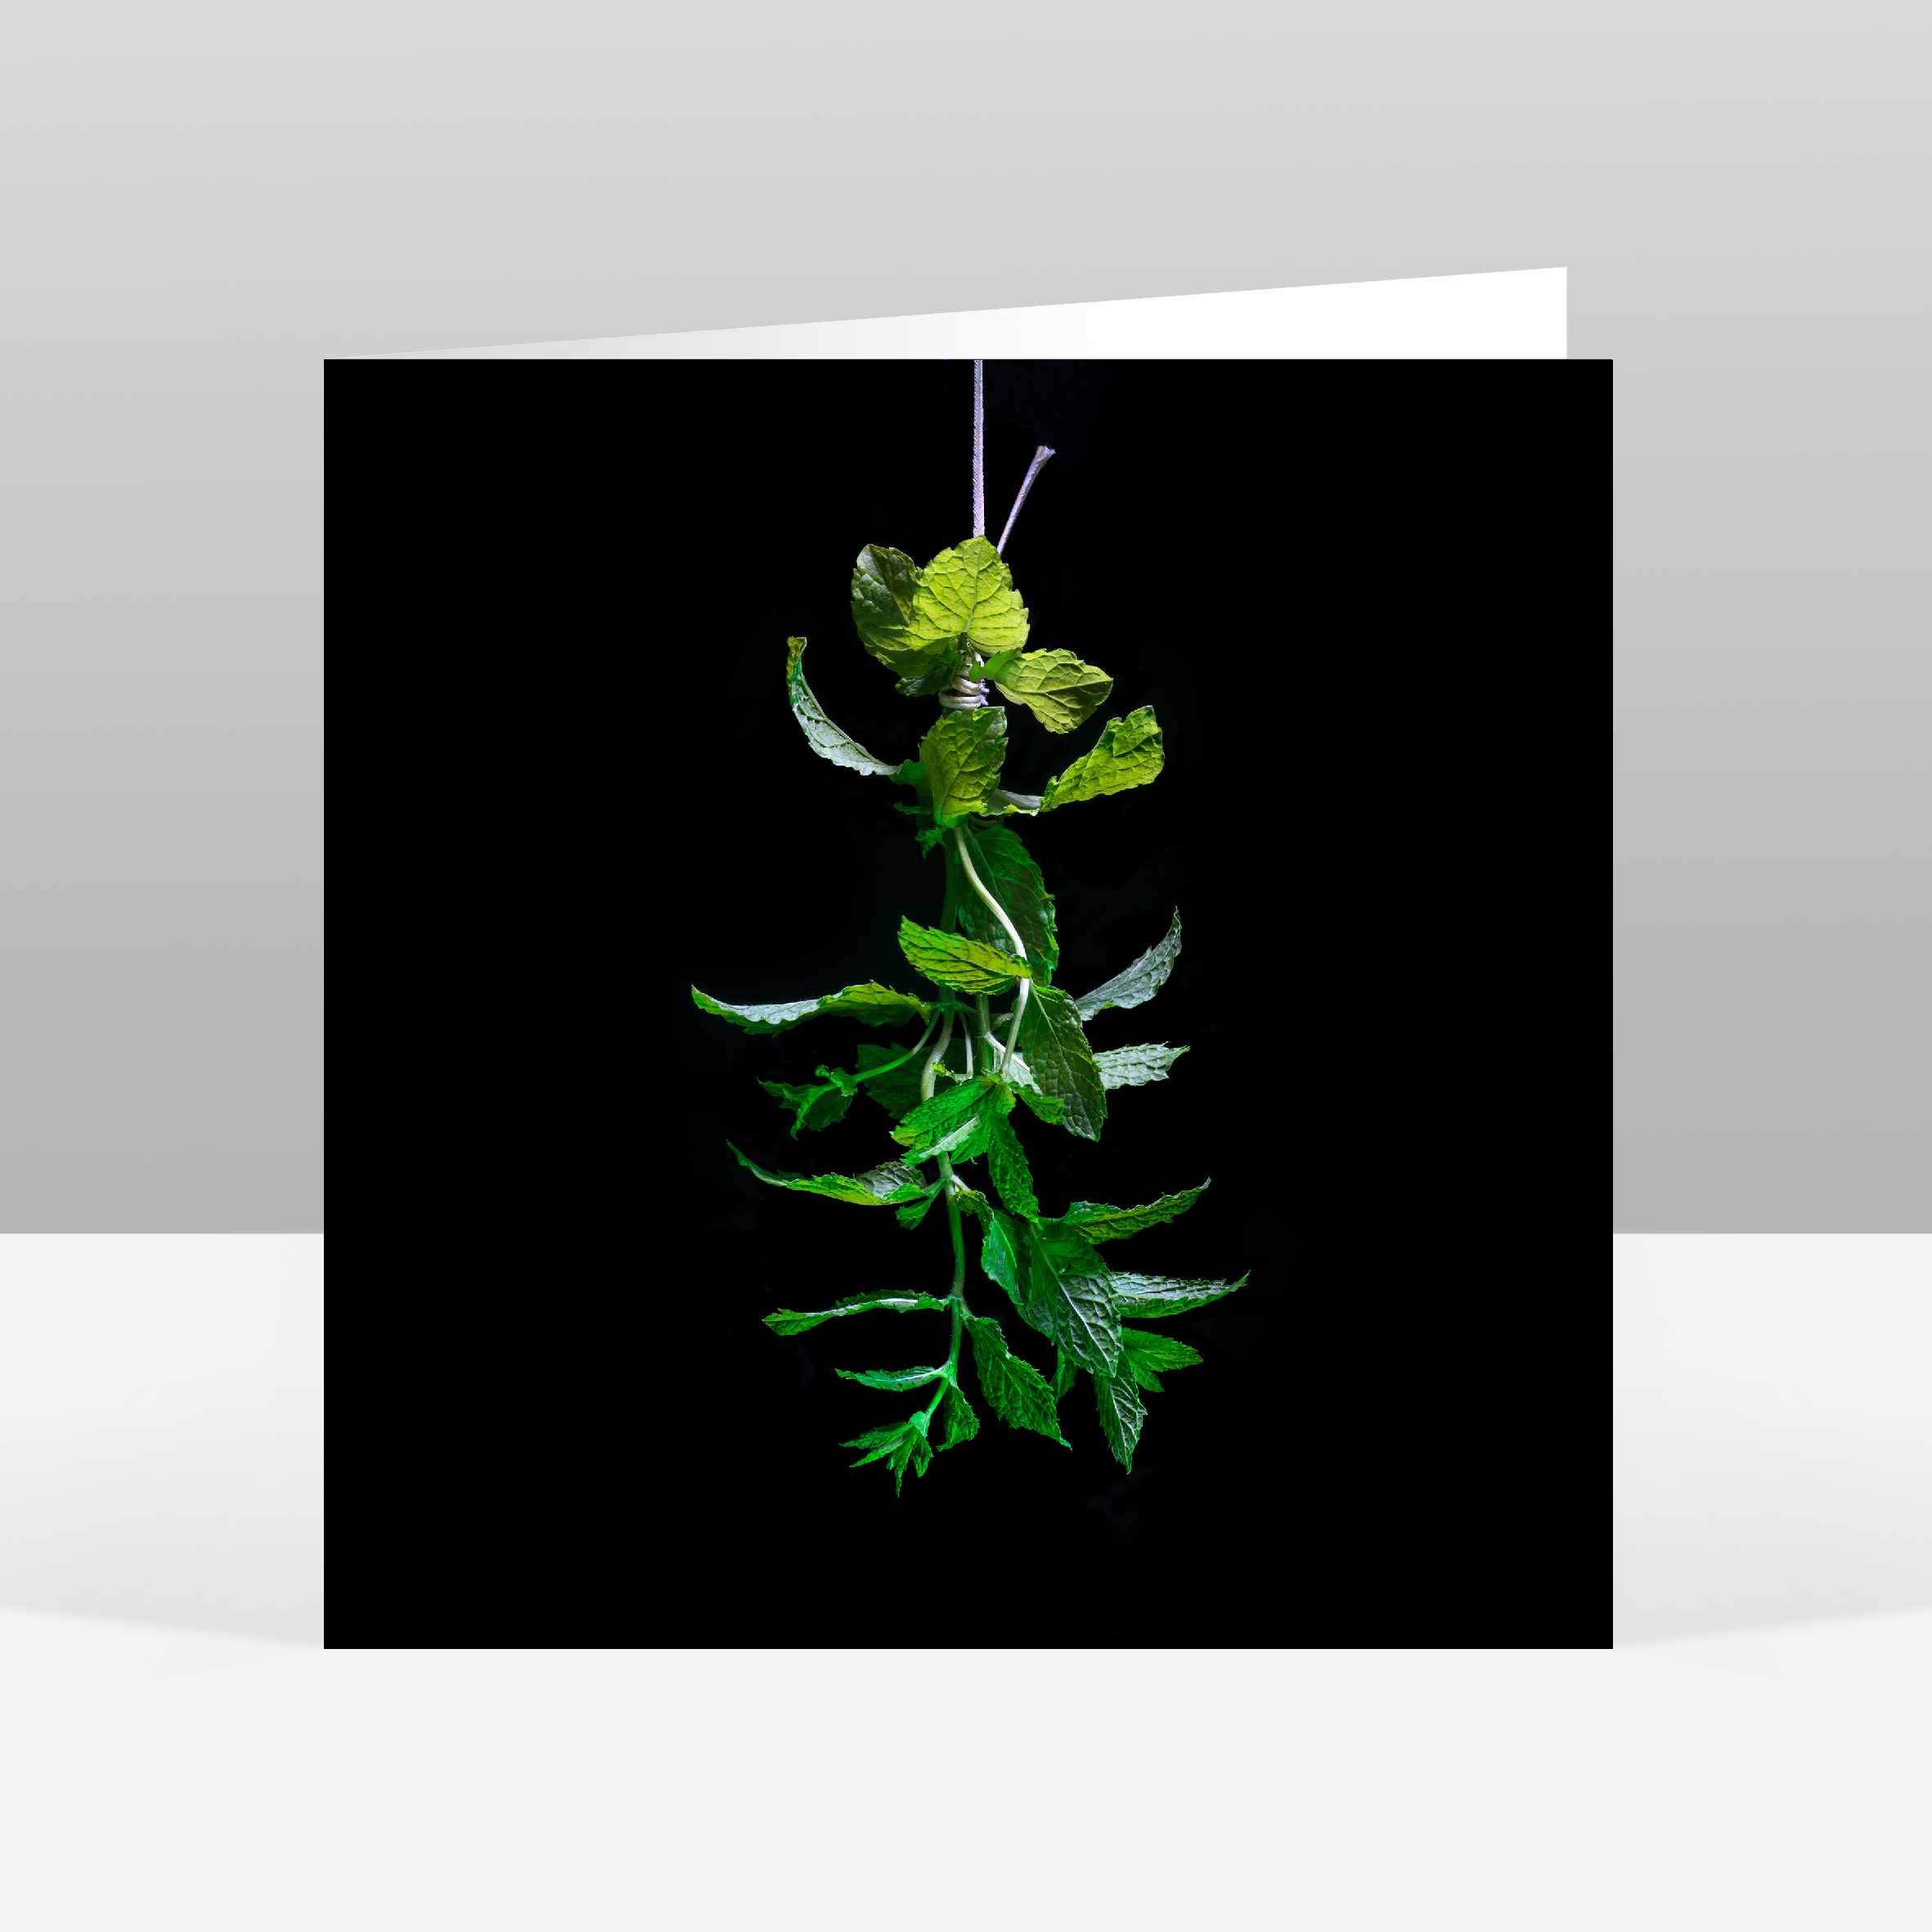 3 Mint Christmas Card Jo Hounsome Photography.jpg